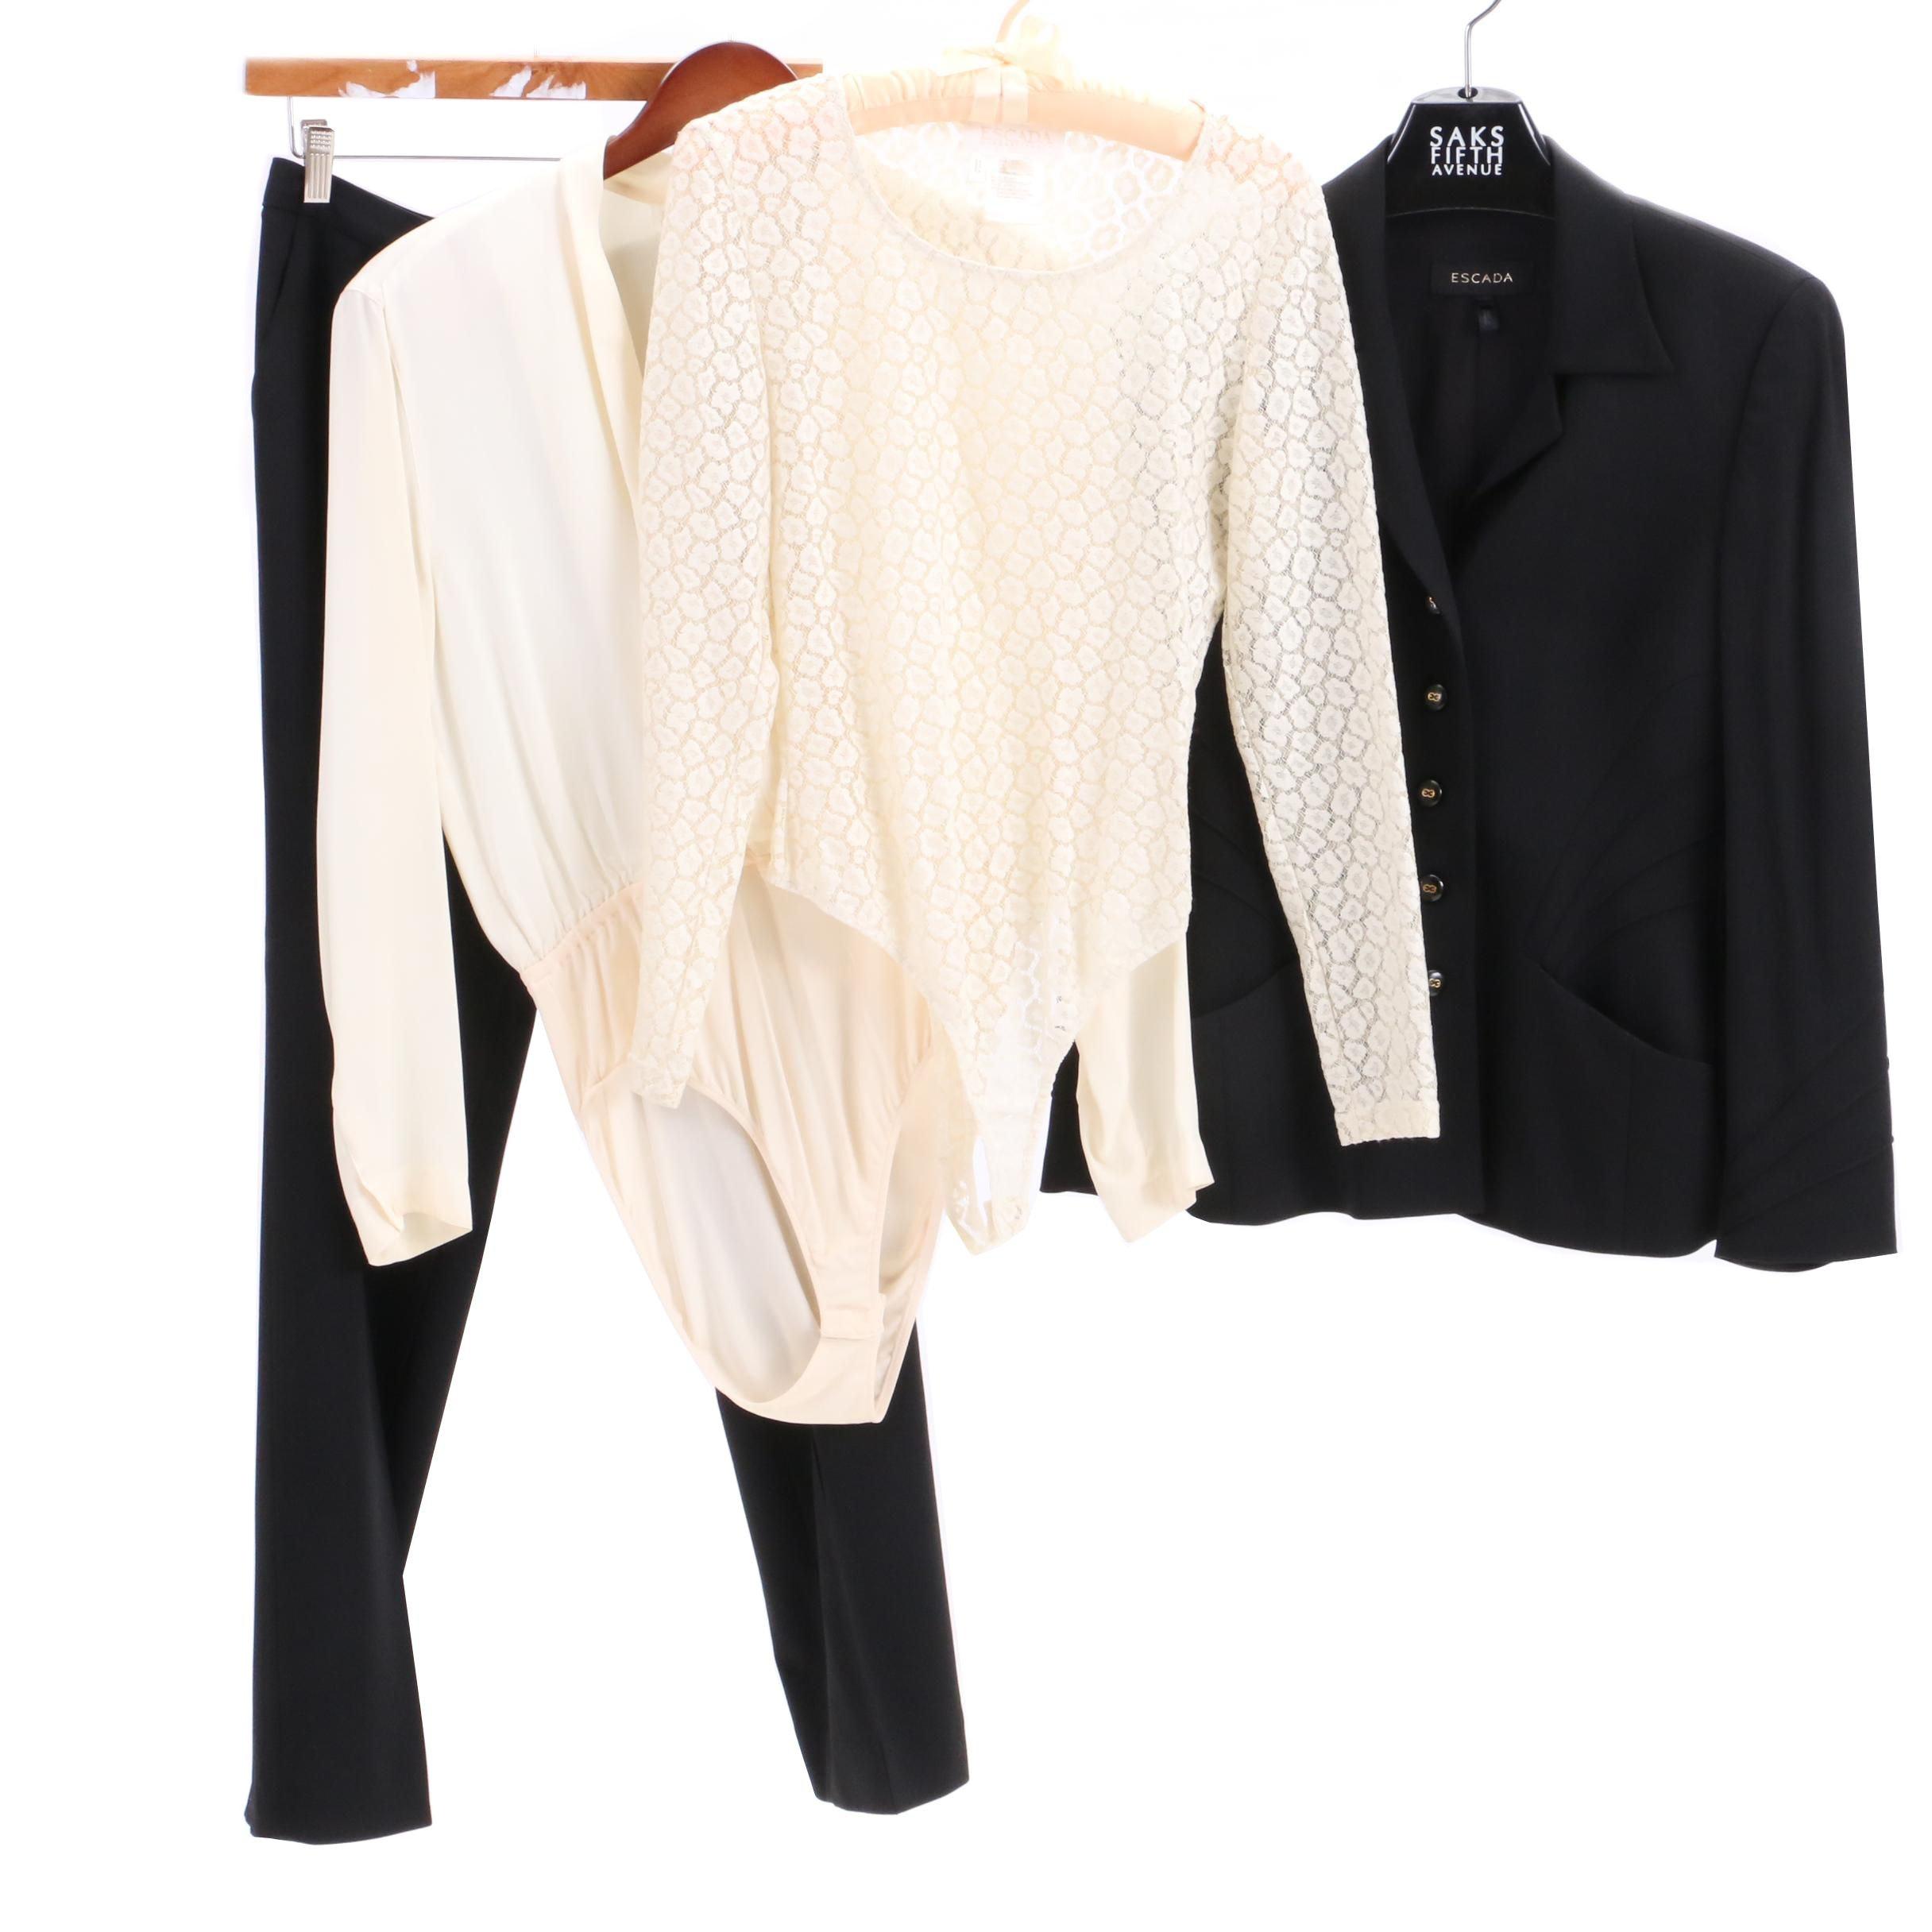 Escada Black Wool Blend Pantsuit with Bodysuits